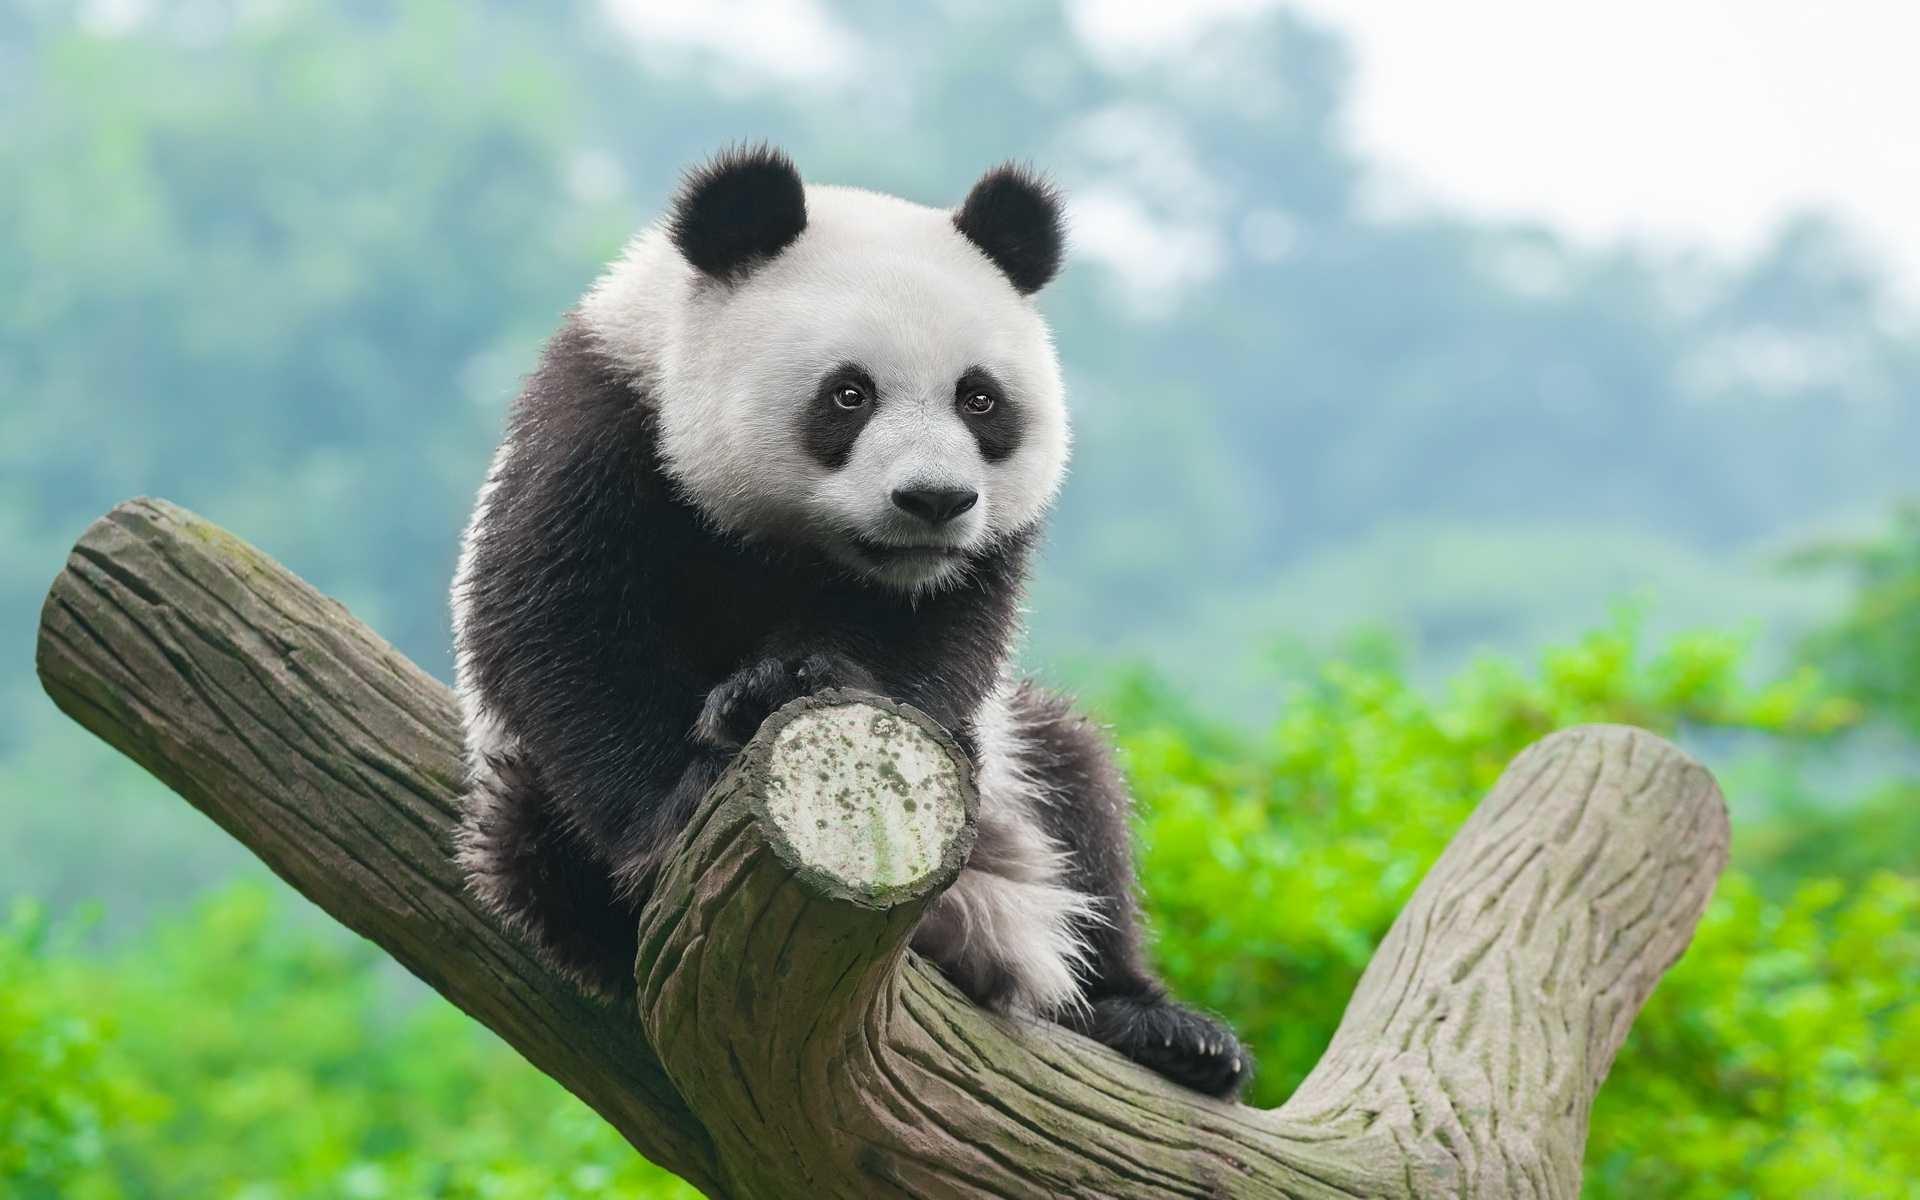 Res: 1920x1200, Panda Background On Wallpaper Hd 1920 x 1200 px 692.31 KB polar snow anime  cute baby